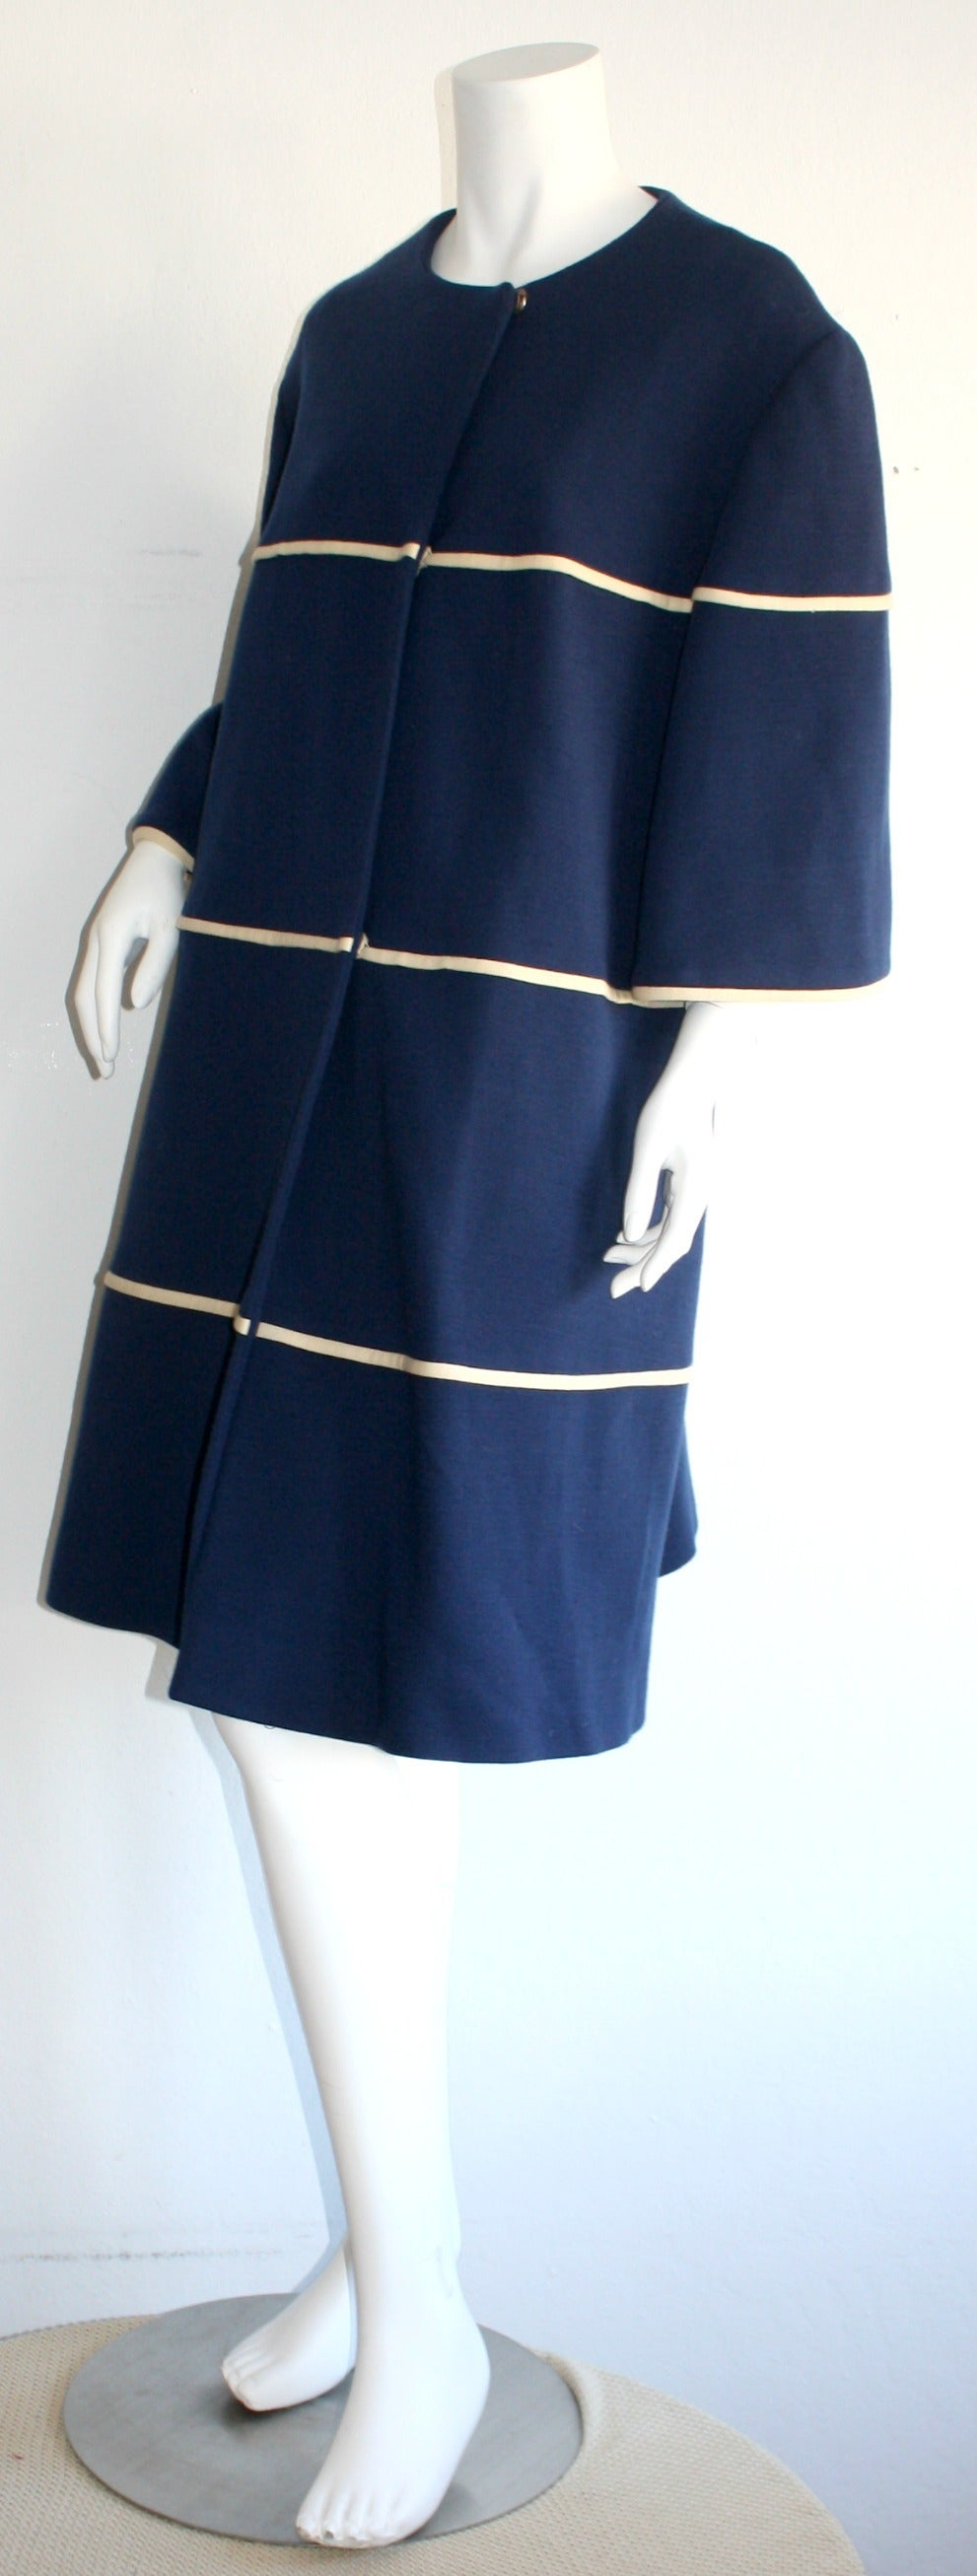 Lilli Ann 1960s Vintage Navy Blue & White Swing Jacket Trapeze Coat For Sale 1